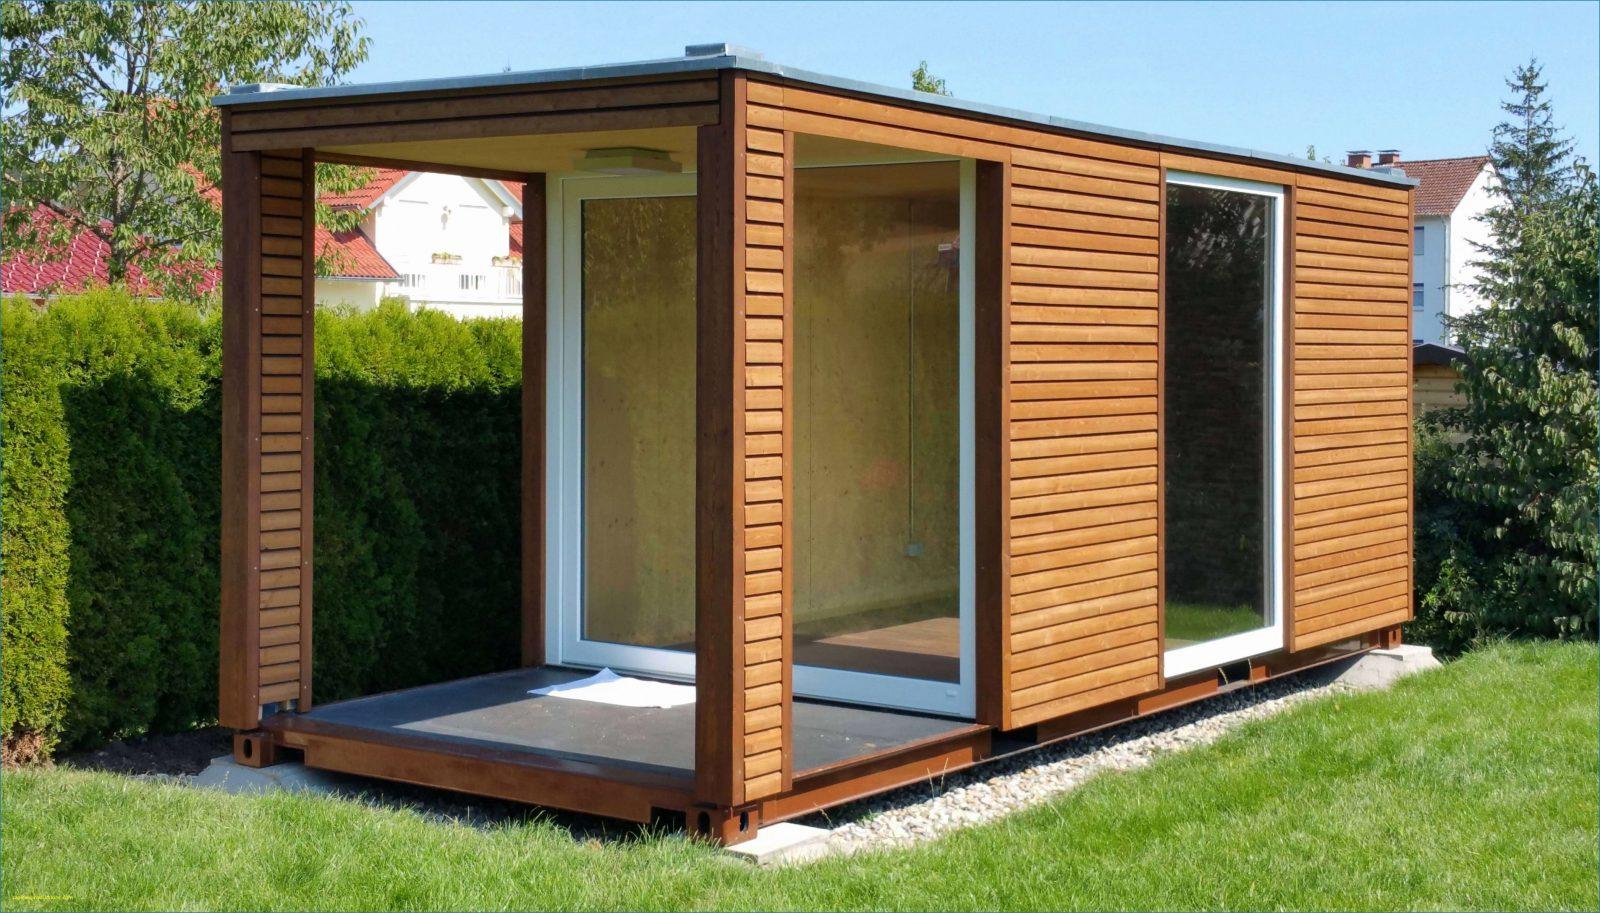 Elegant Kollektion Von Gartenhaus Ytong Selber Bauen  Grundrisse von Gartenhaus Ytong Selber Bauen Bild